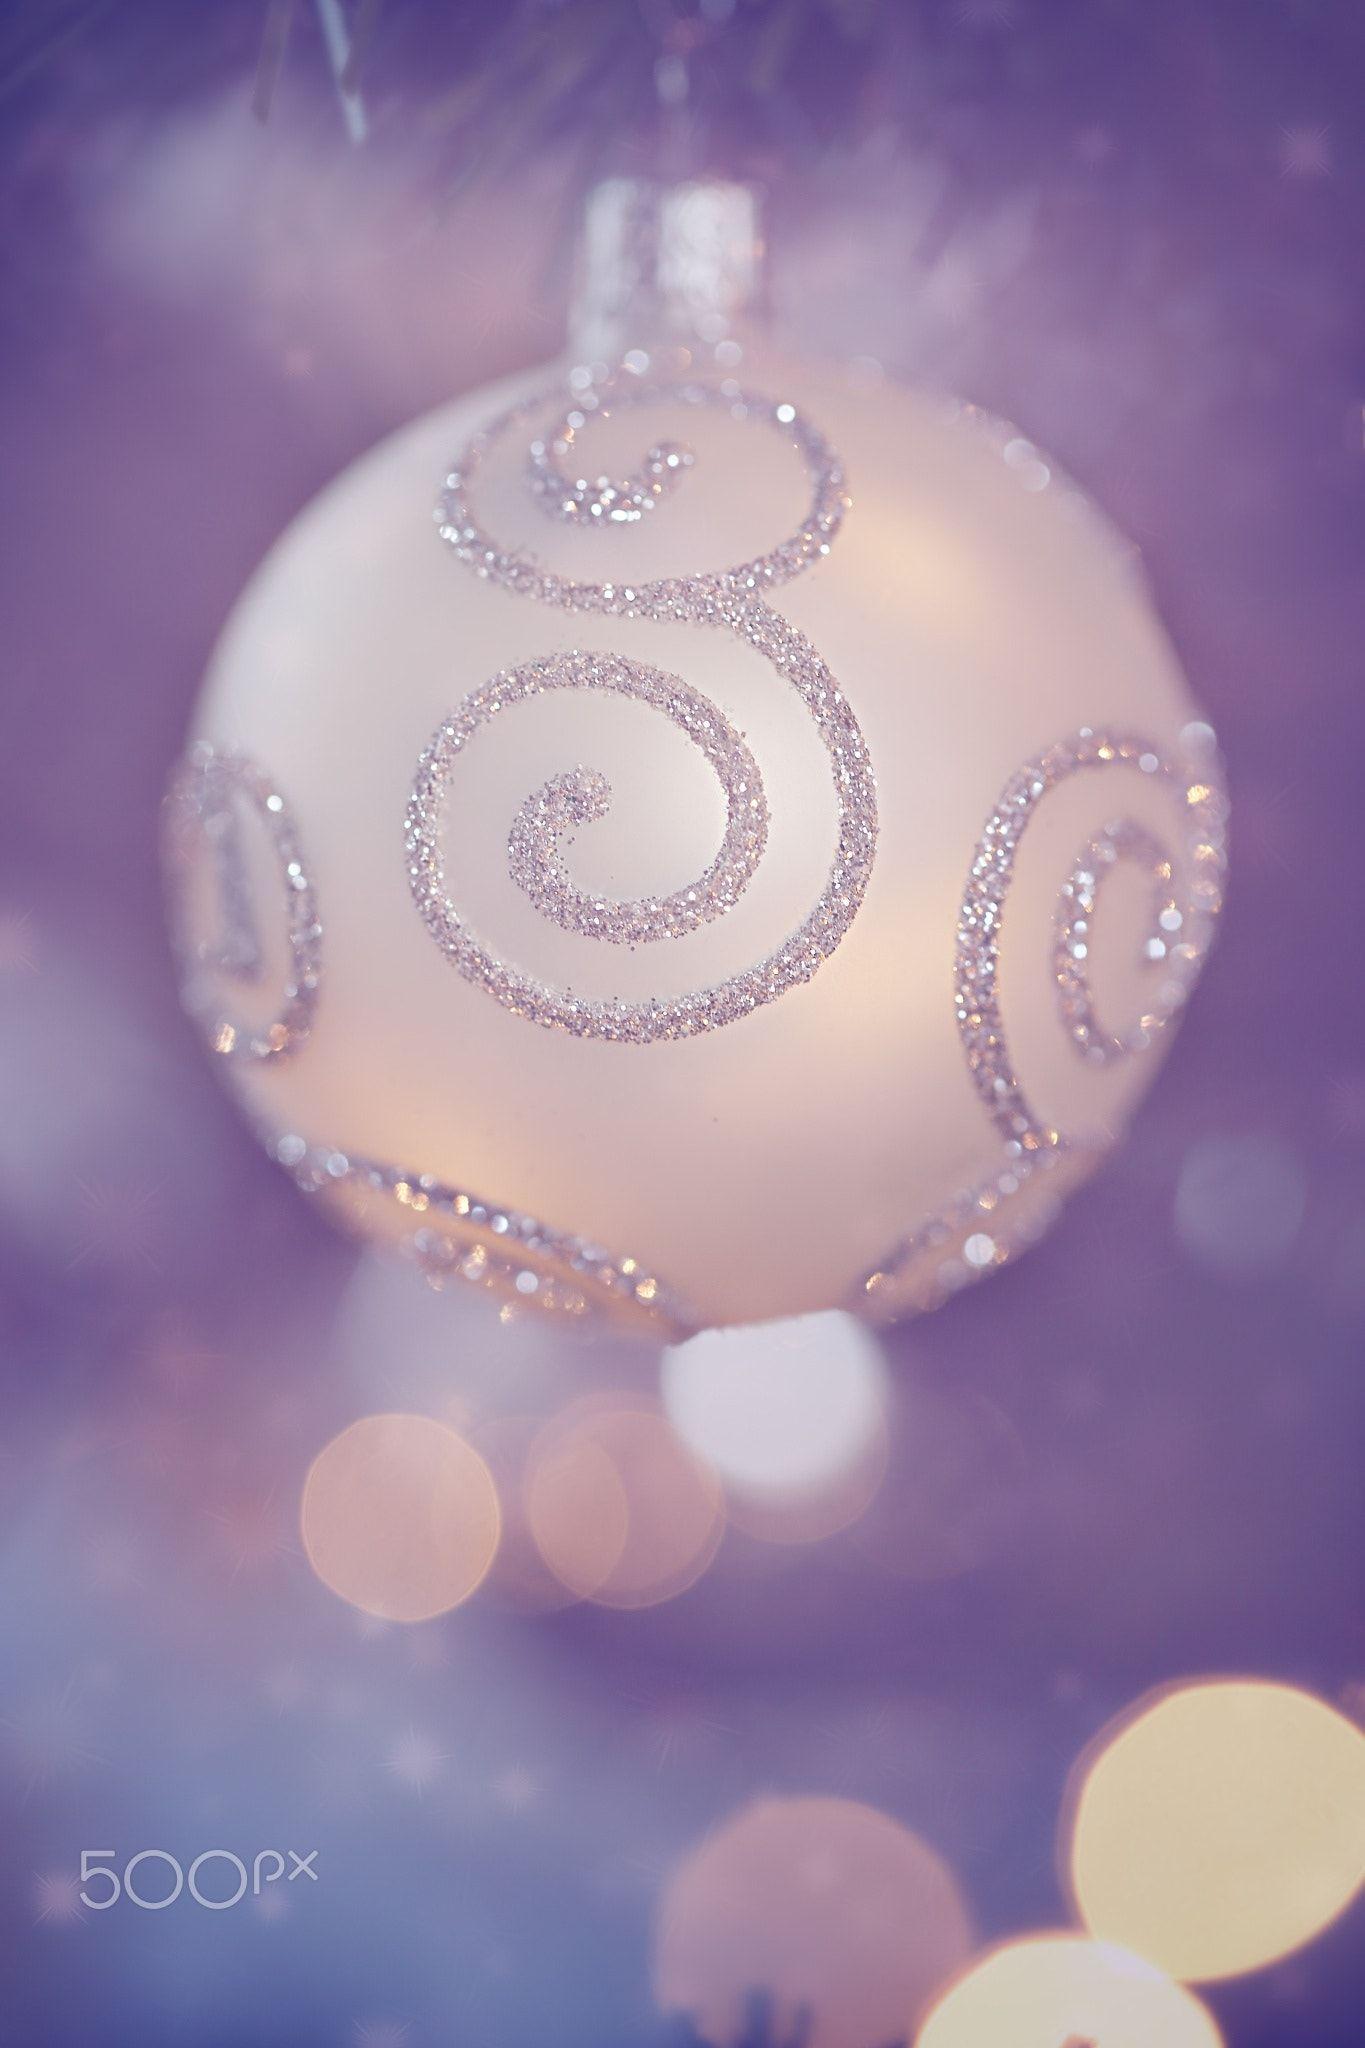 Merry Christmas - Wishing you all a wonderful Christmas